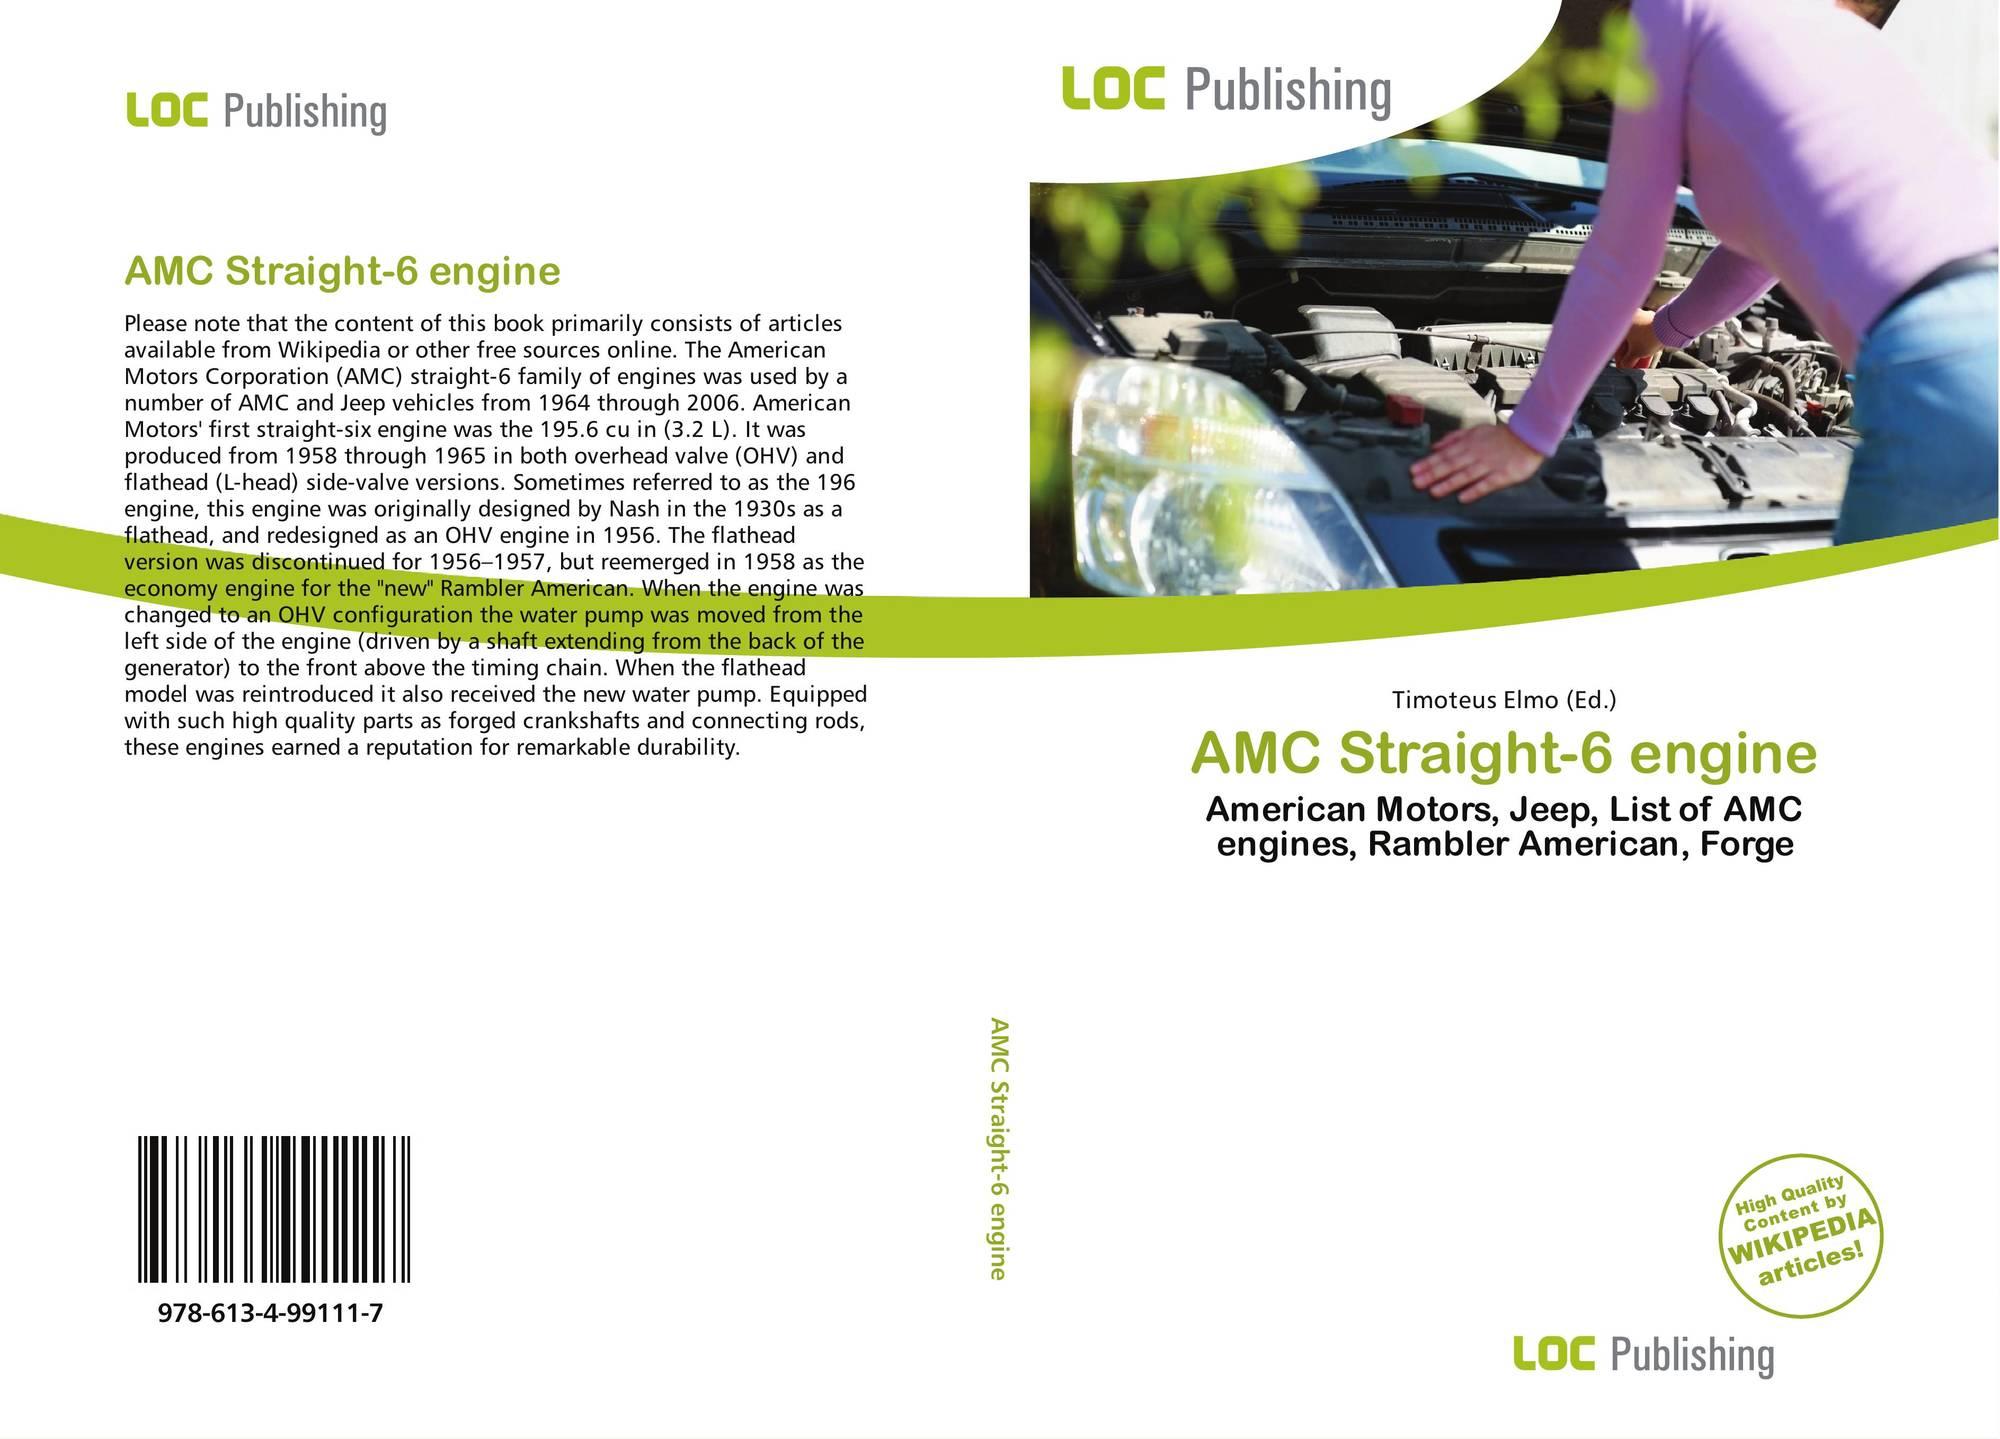 AMC Straight-6 engine, 978-613-4-99111-7, 6134991112